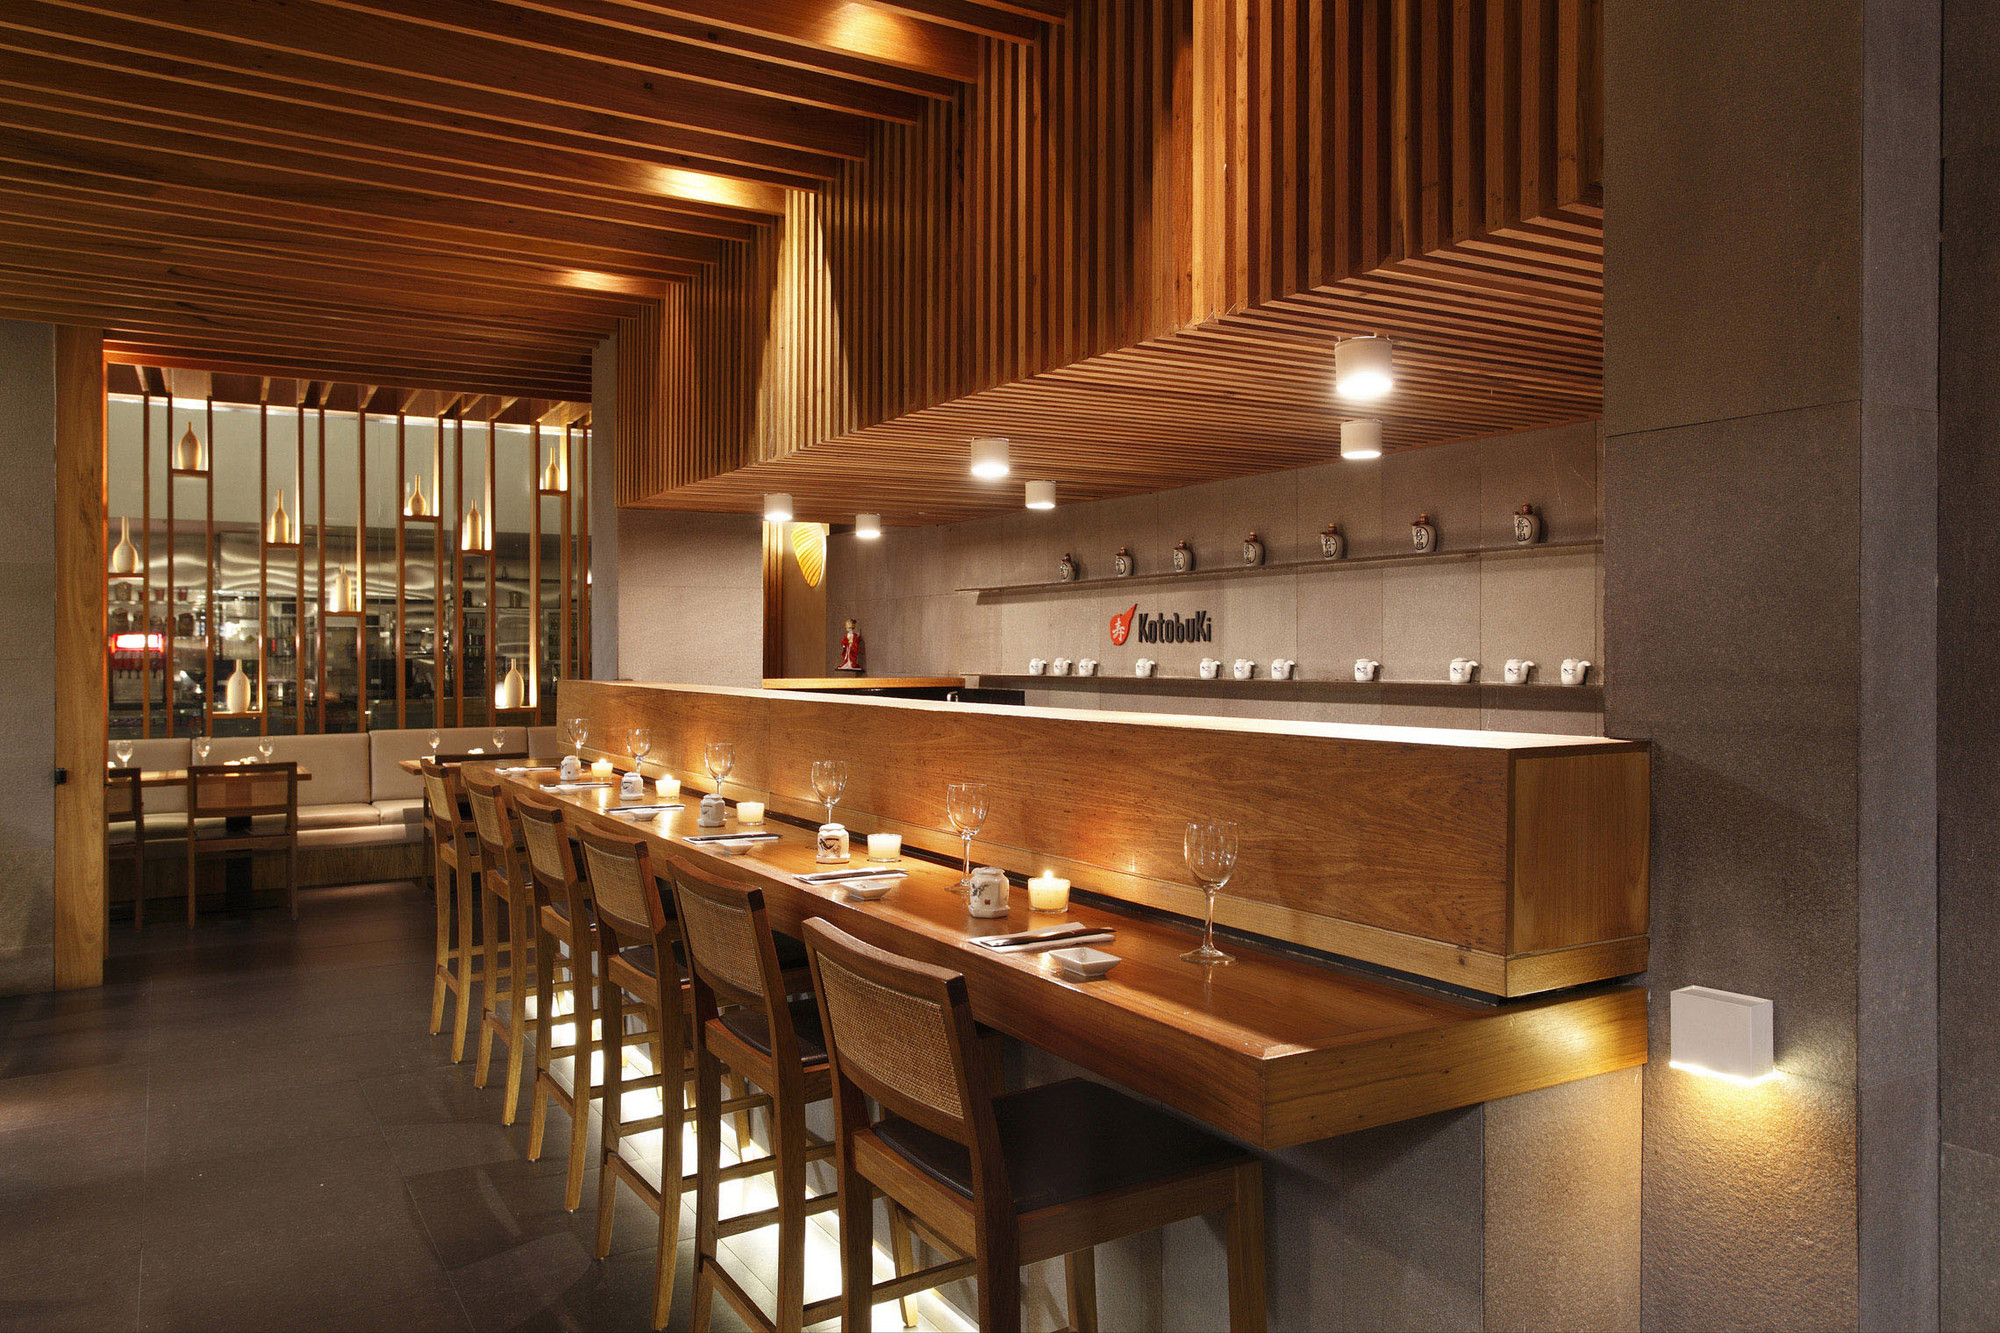 Restaurante Kotobuki / Ivan Rezende Arquitetura, © MCA Studio